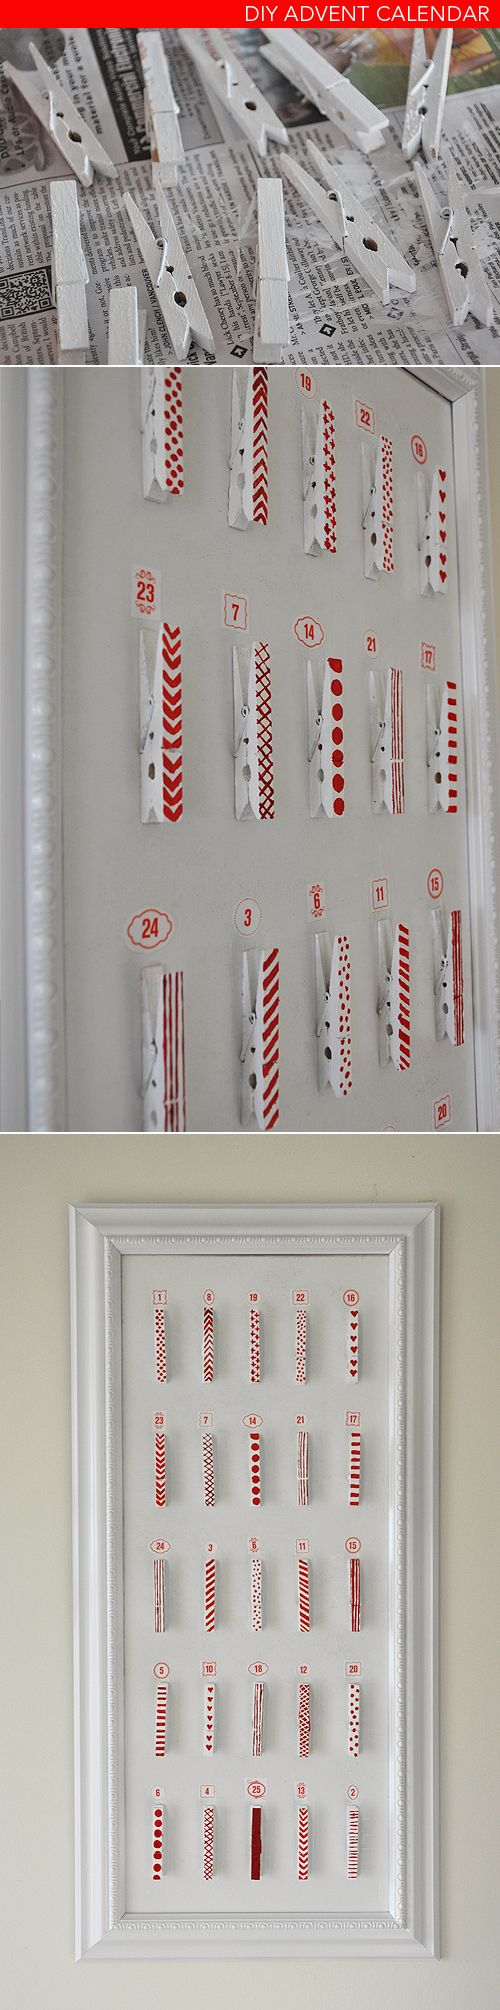 We love Christmas Crafts! Love this DIY Advent Calendar. #QVCholiday